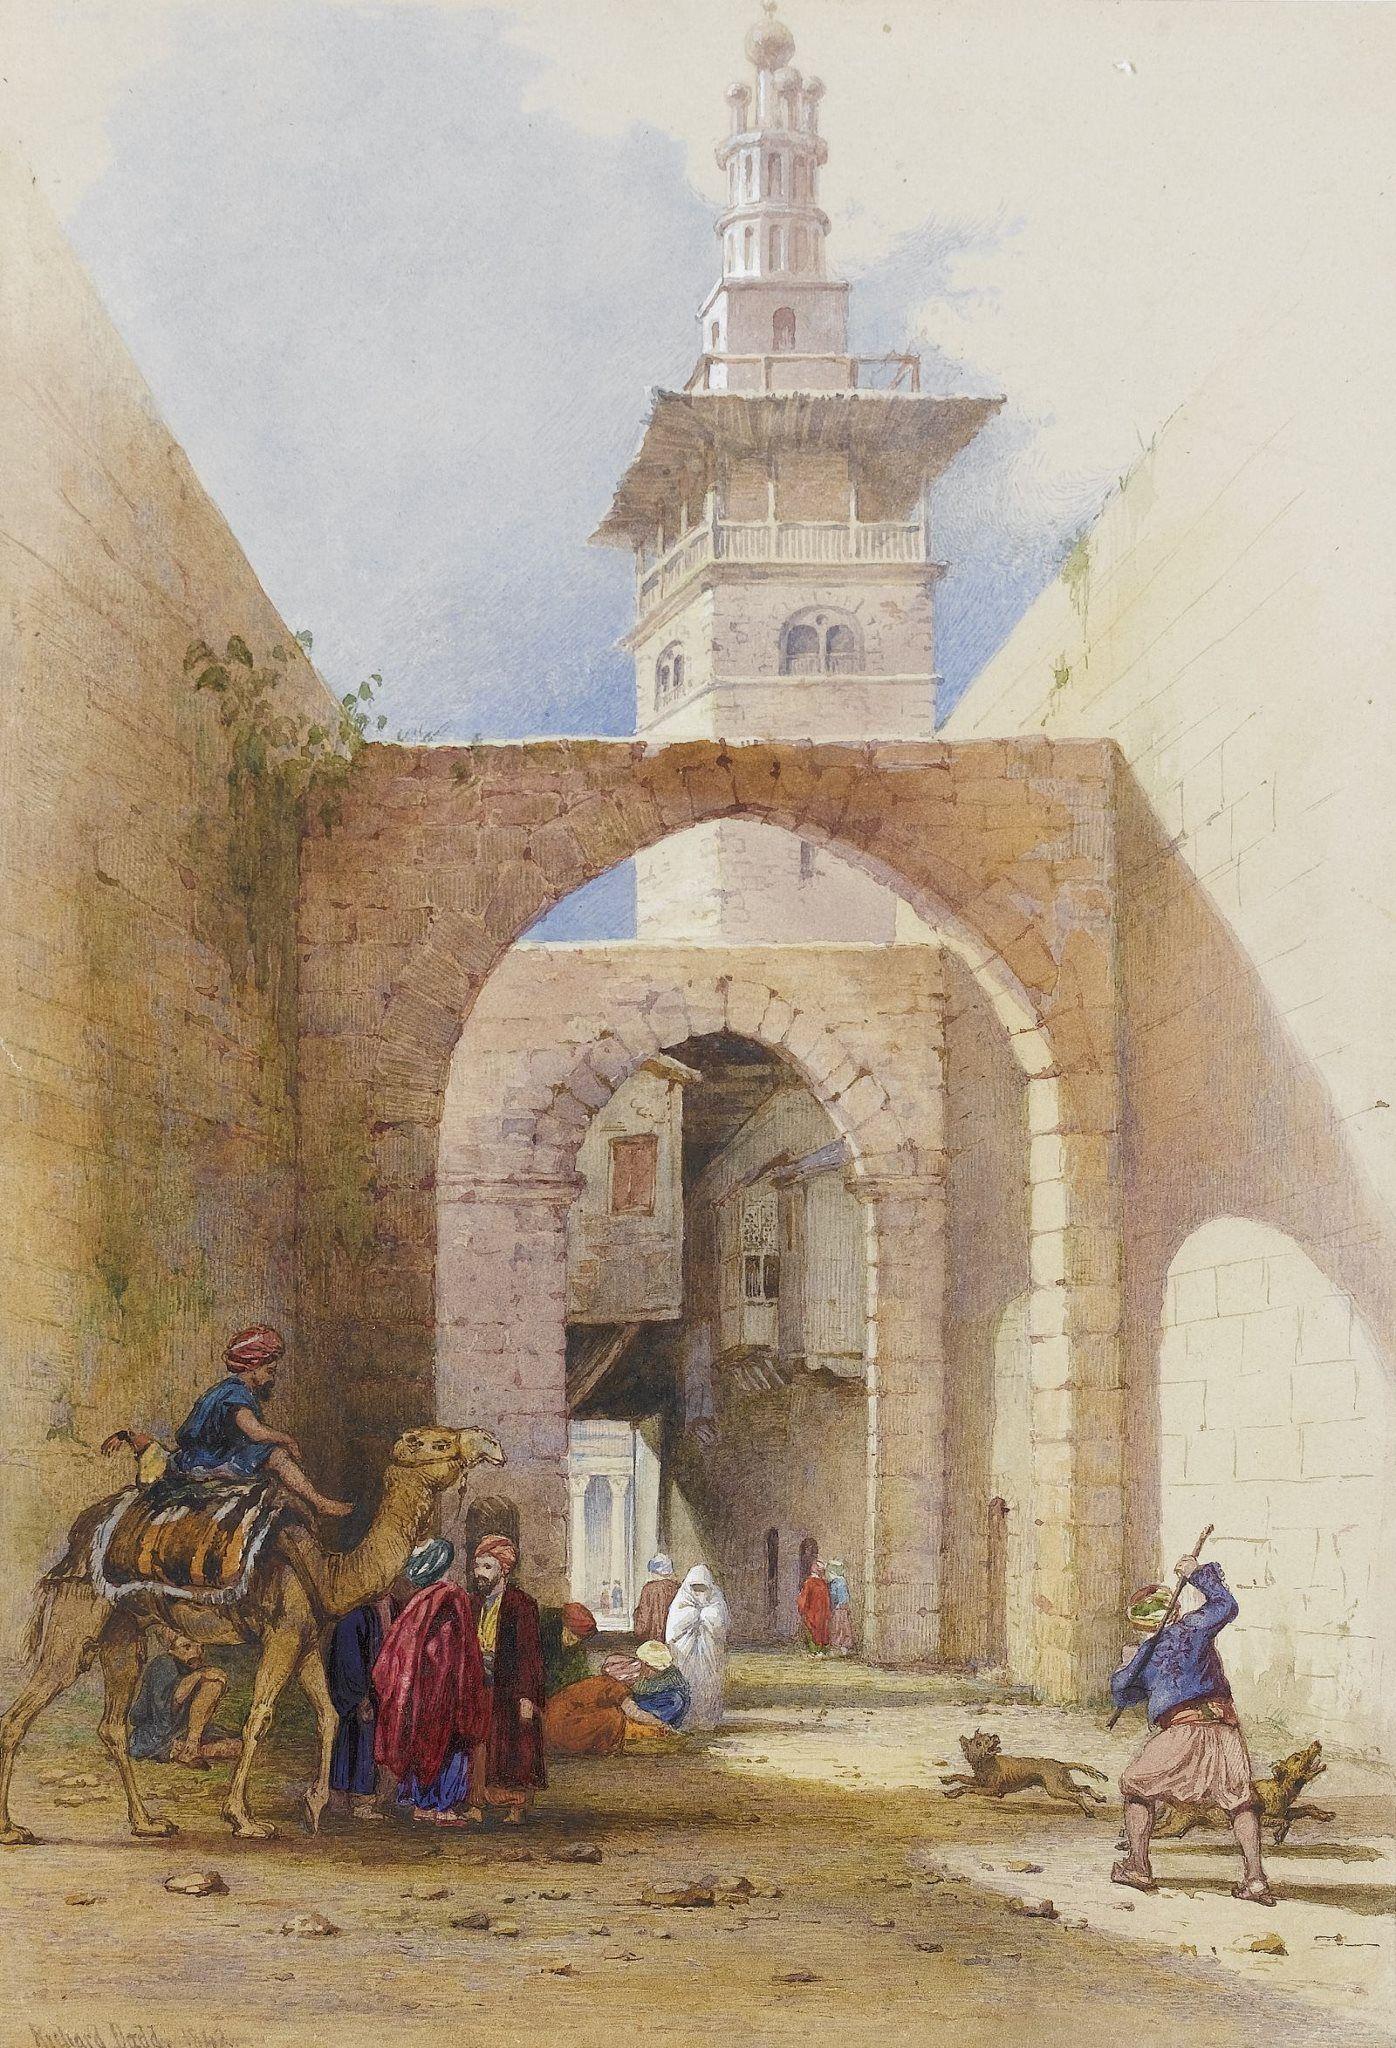 Jerusalem Old City In 18th Century Art Richard Dadd Islamic Art